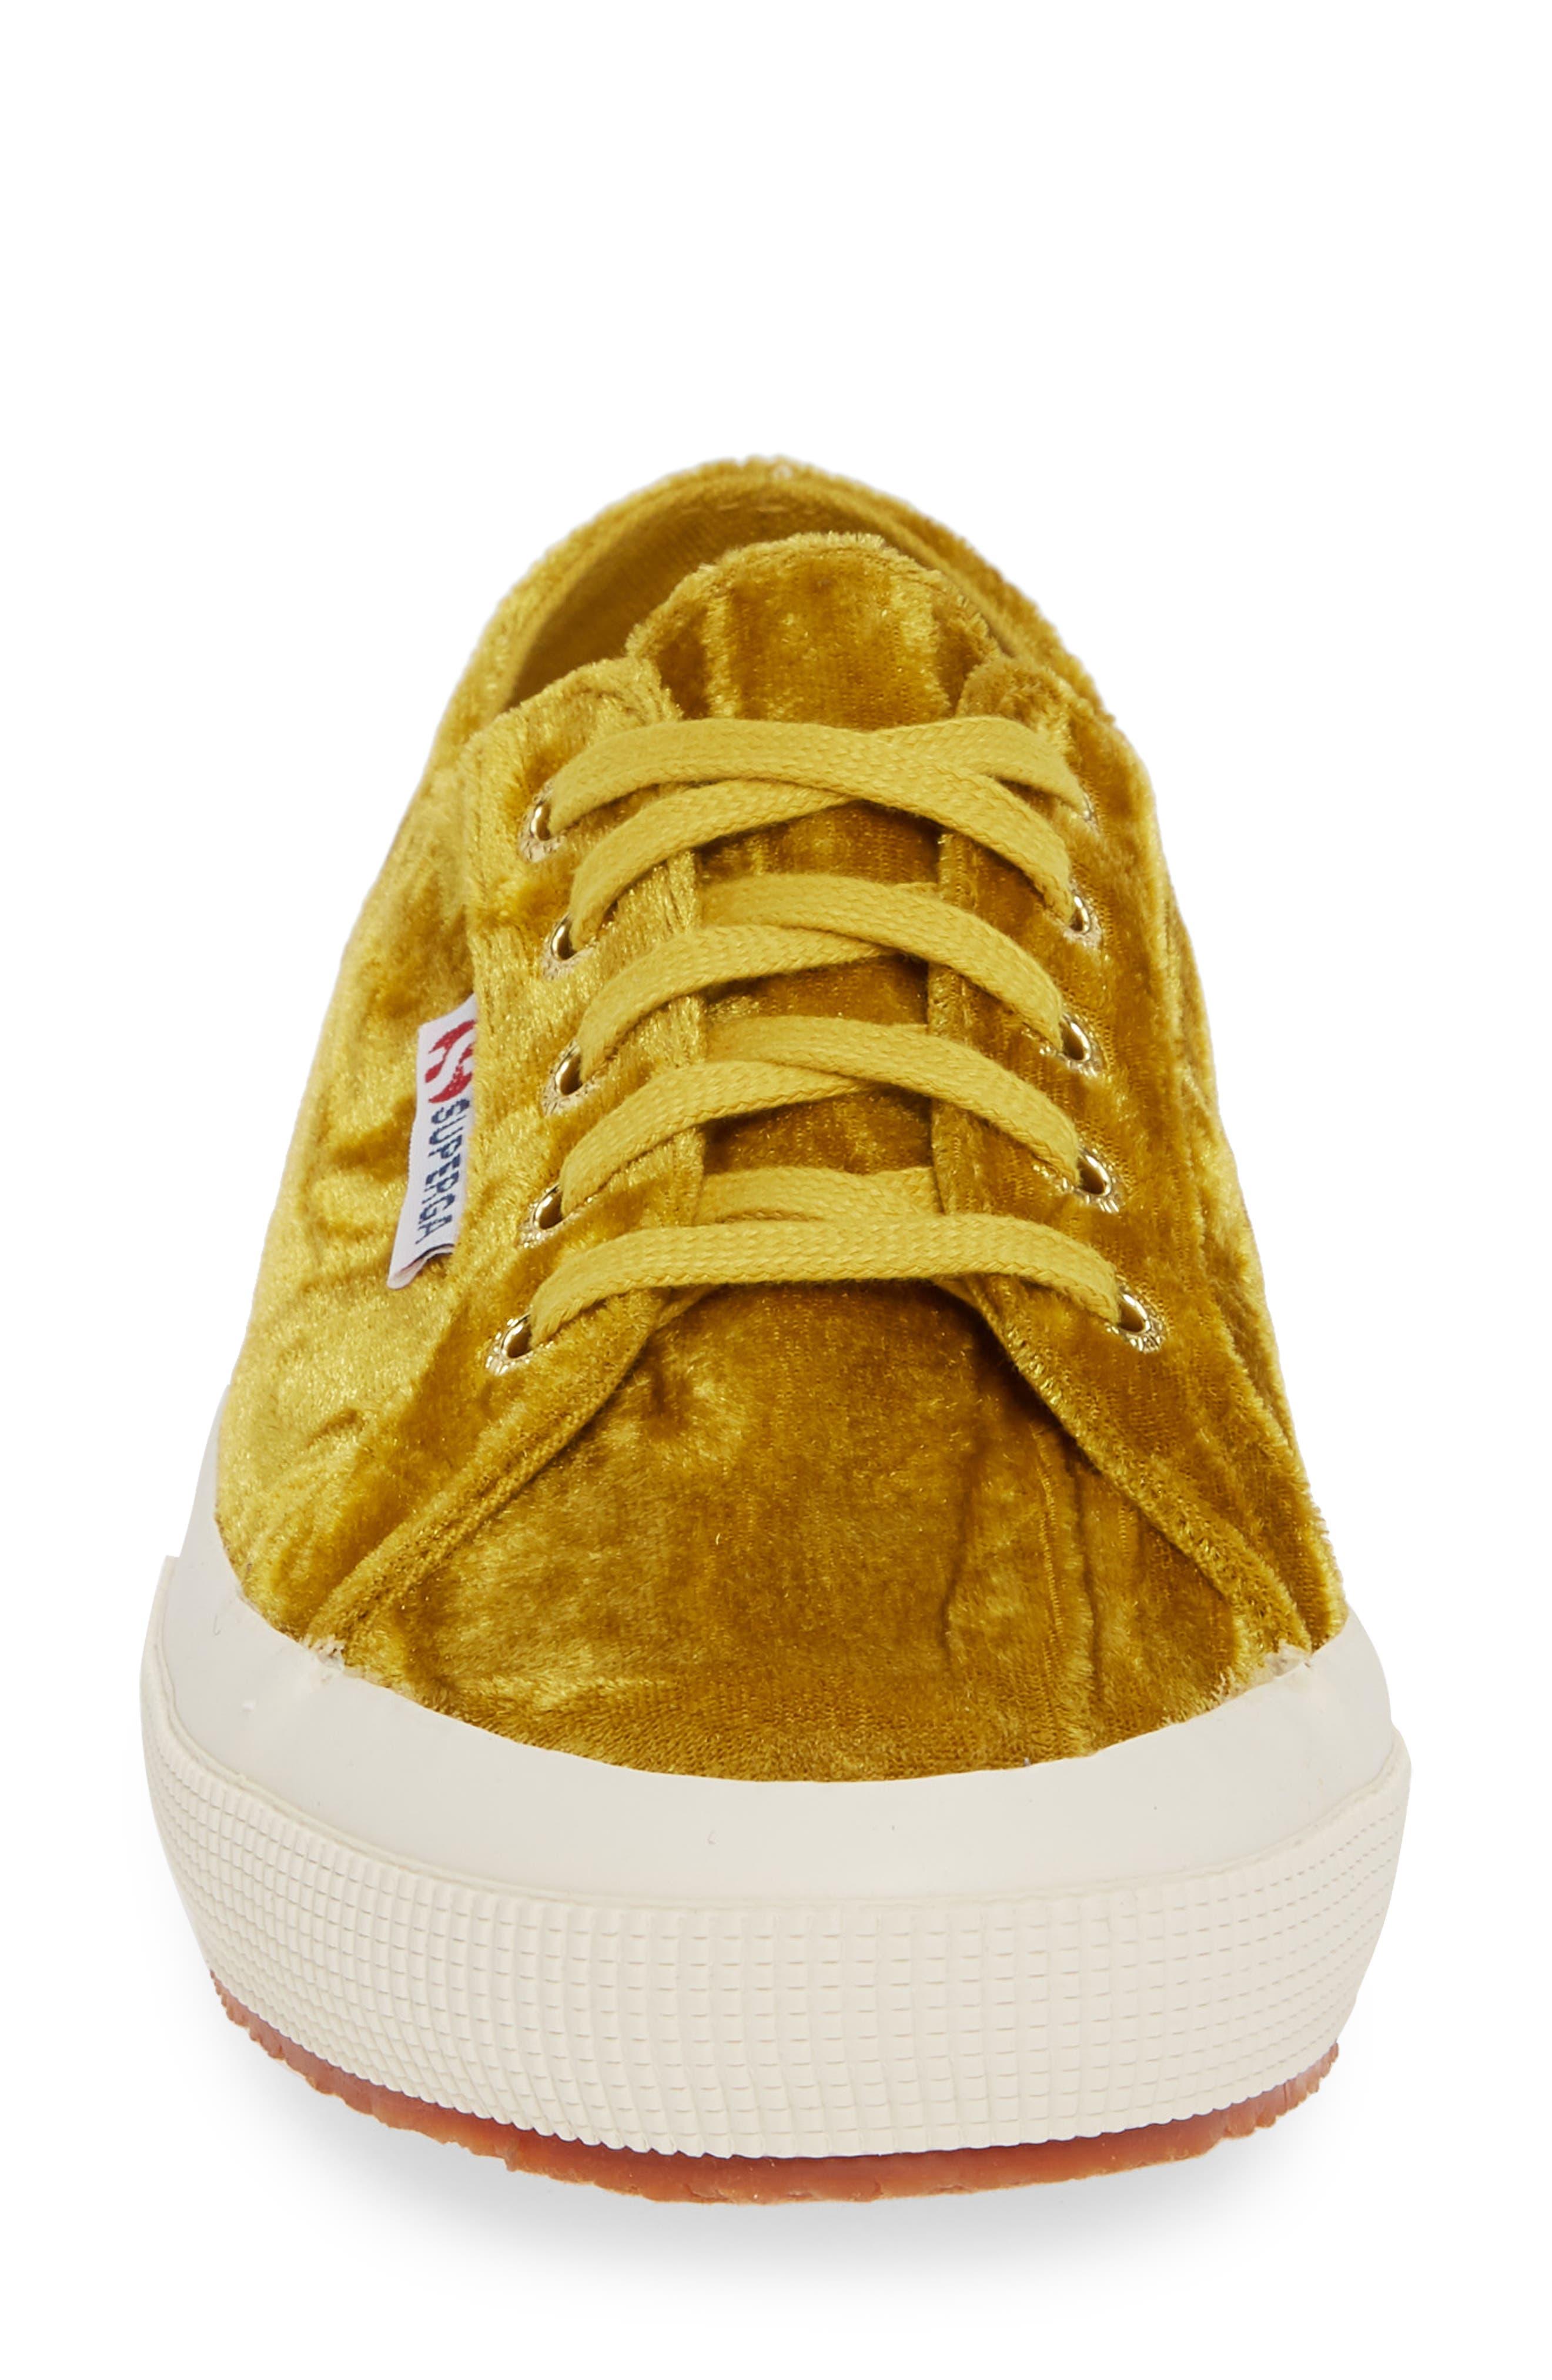 SUPERGA,                             2750 Sneaker,                             Alternate thumbnail 4, color,                             700